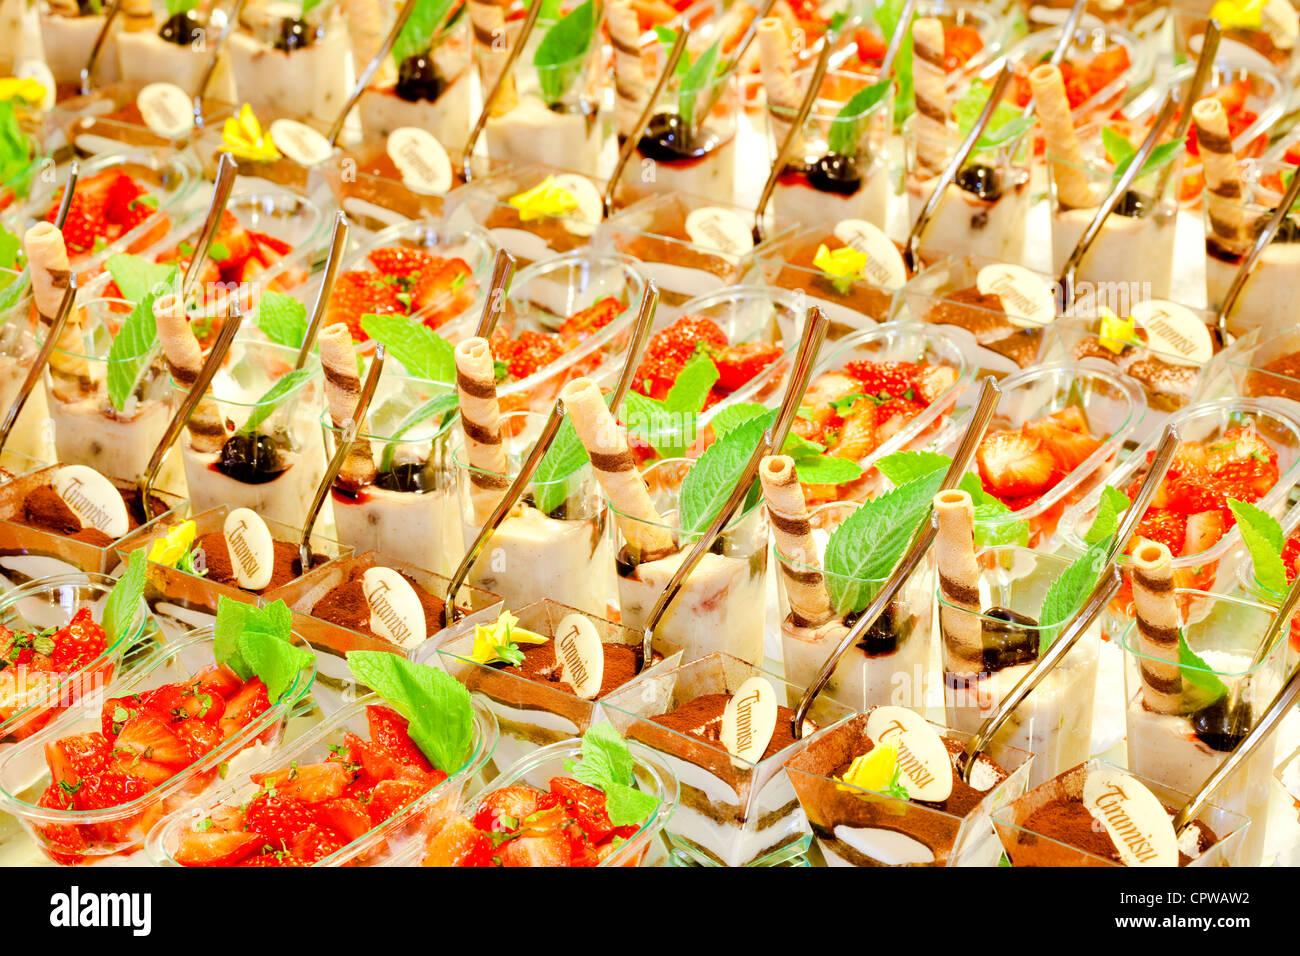 tiramisu dessert served at a party - Stock Image